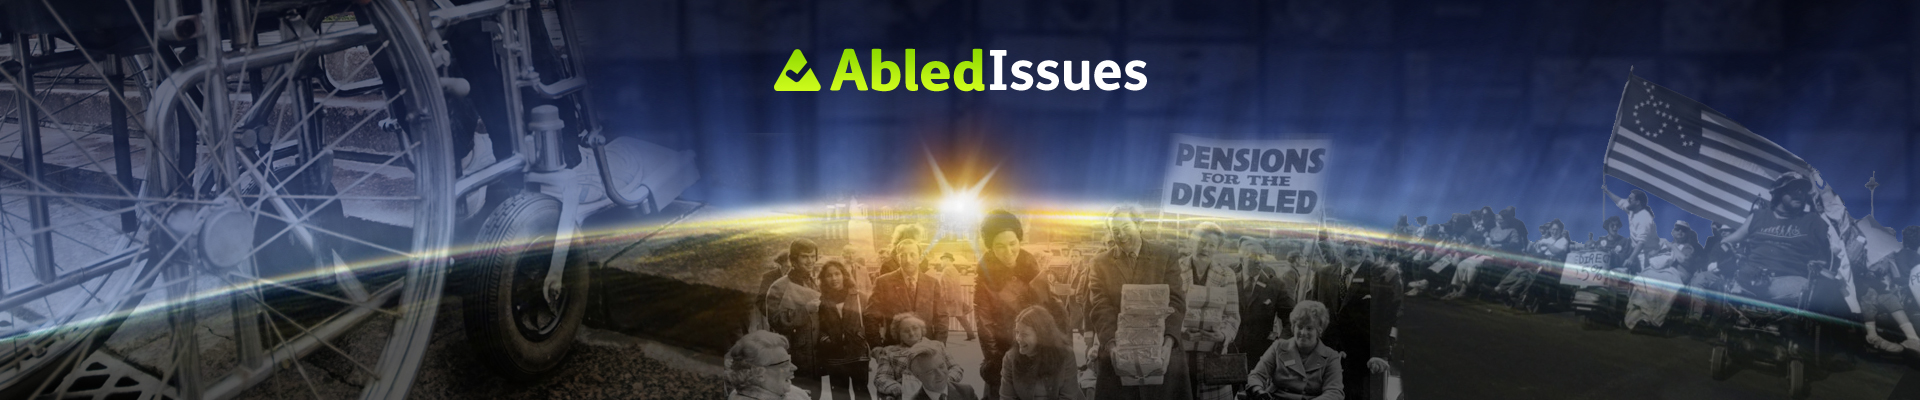 AbledIssues-Banner-1920x400